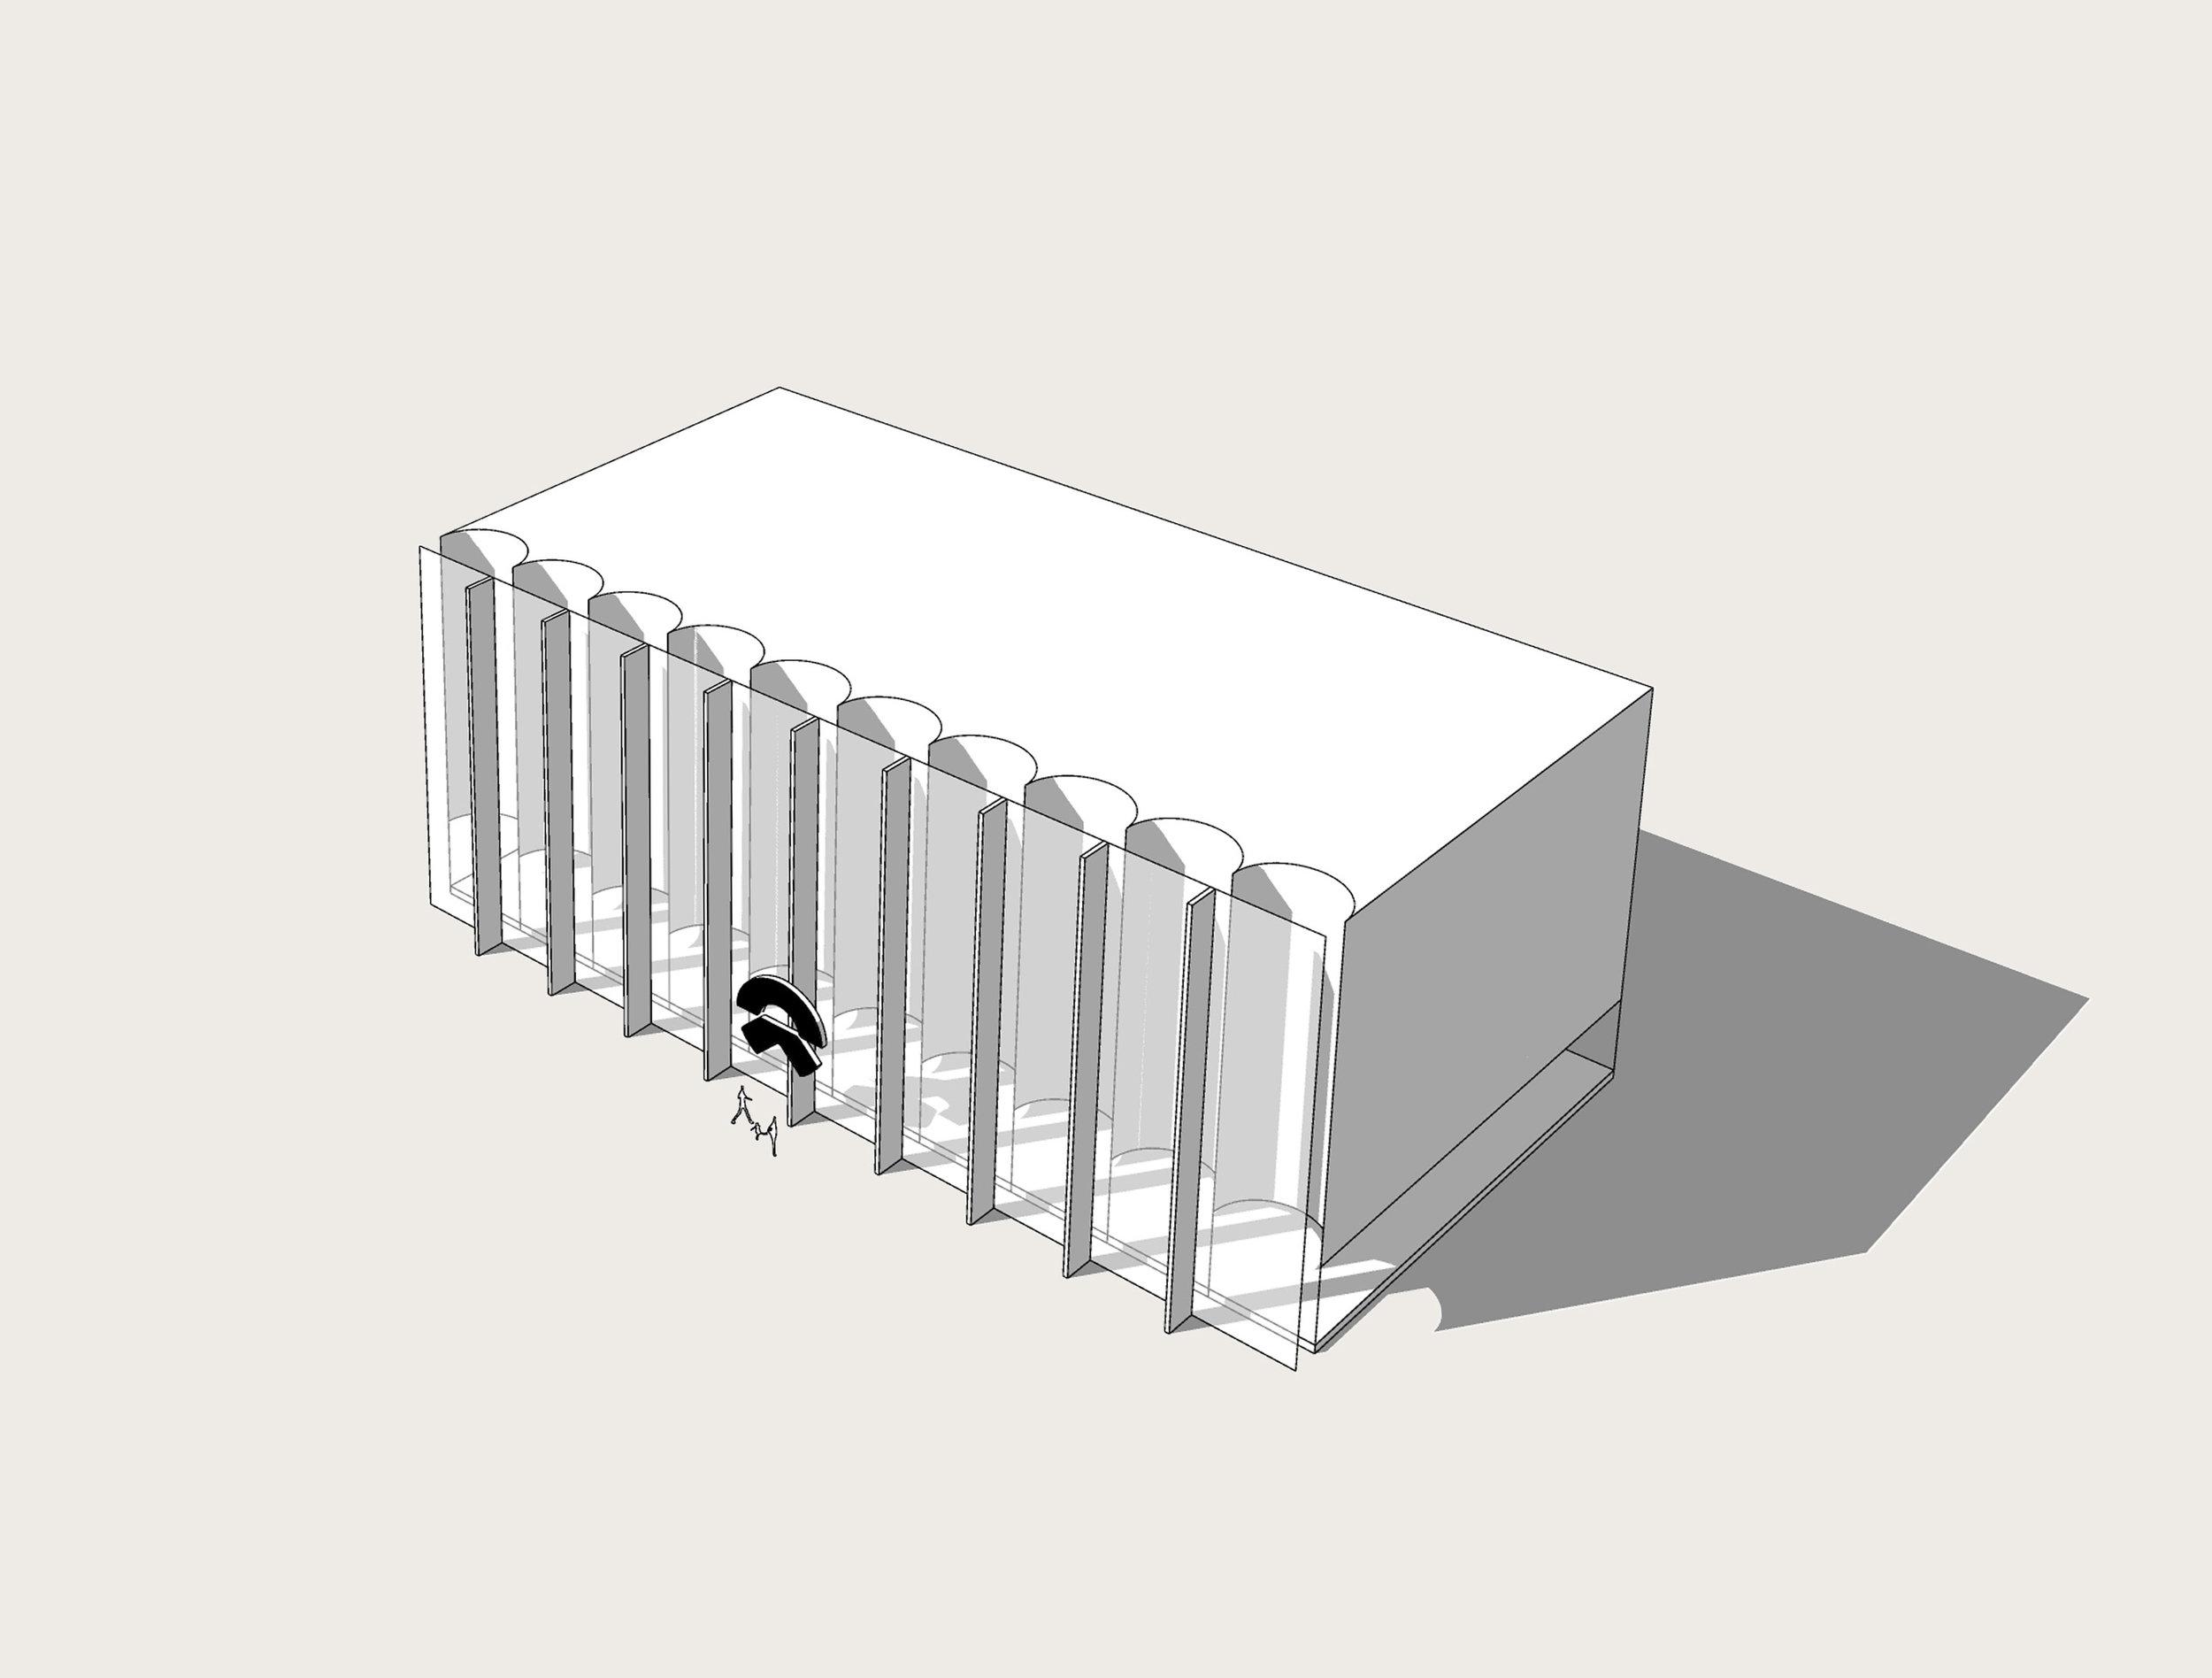 raams-architecture-design-studio-flagship-store-changsha-china-retail-03.jpg